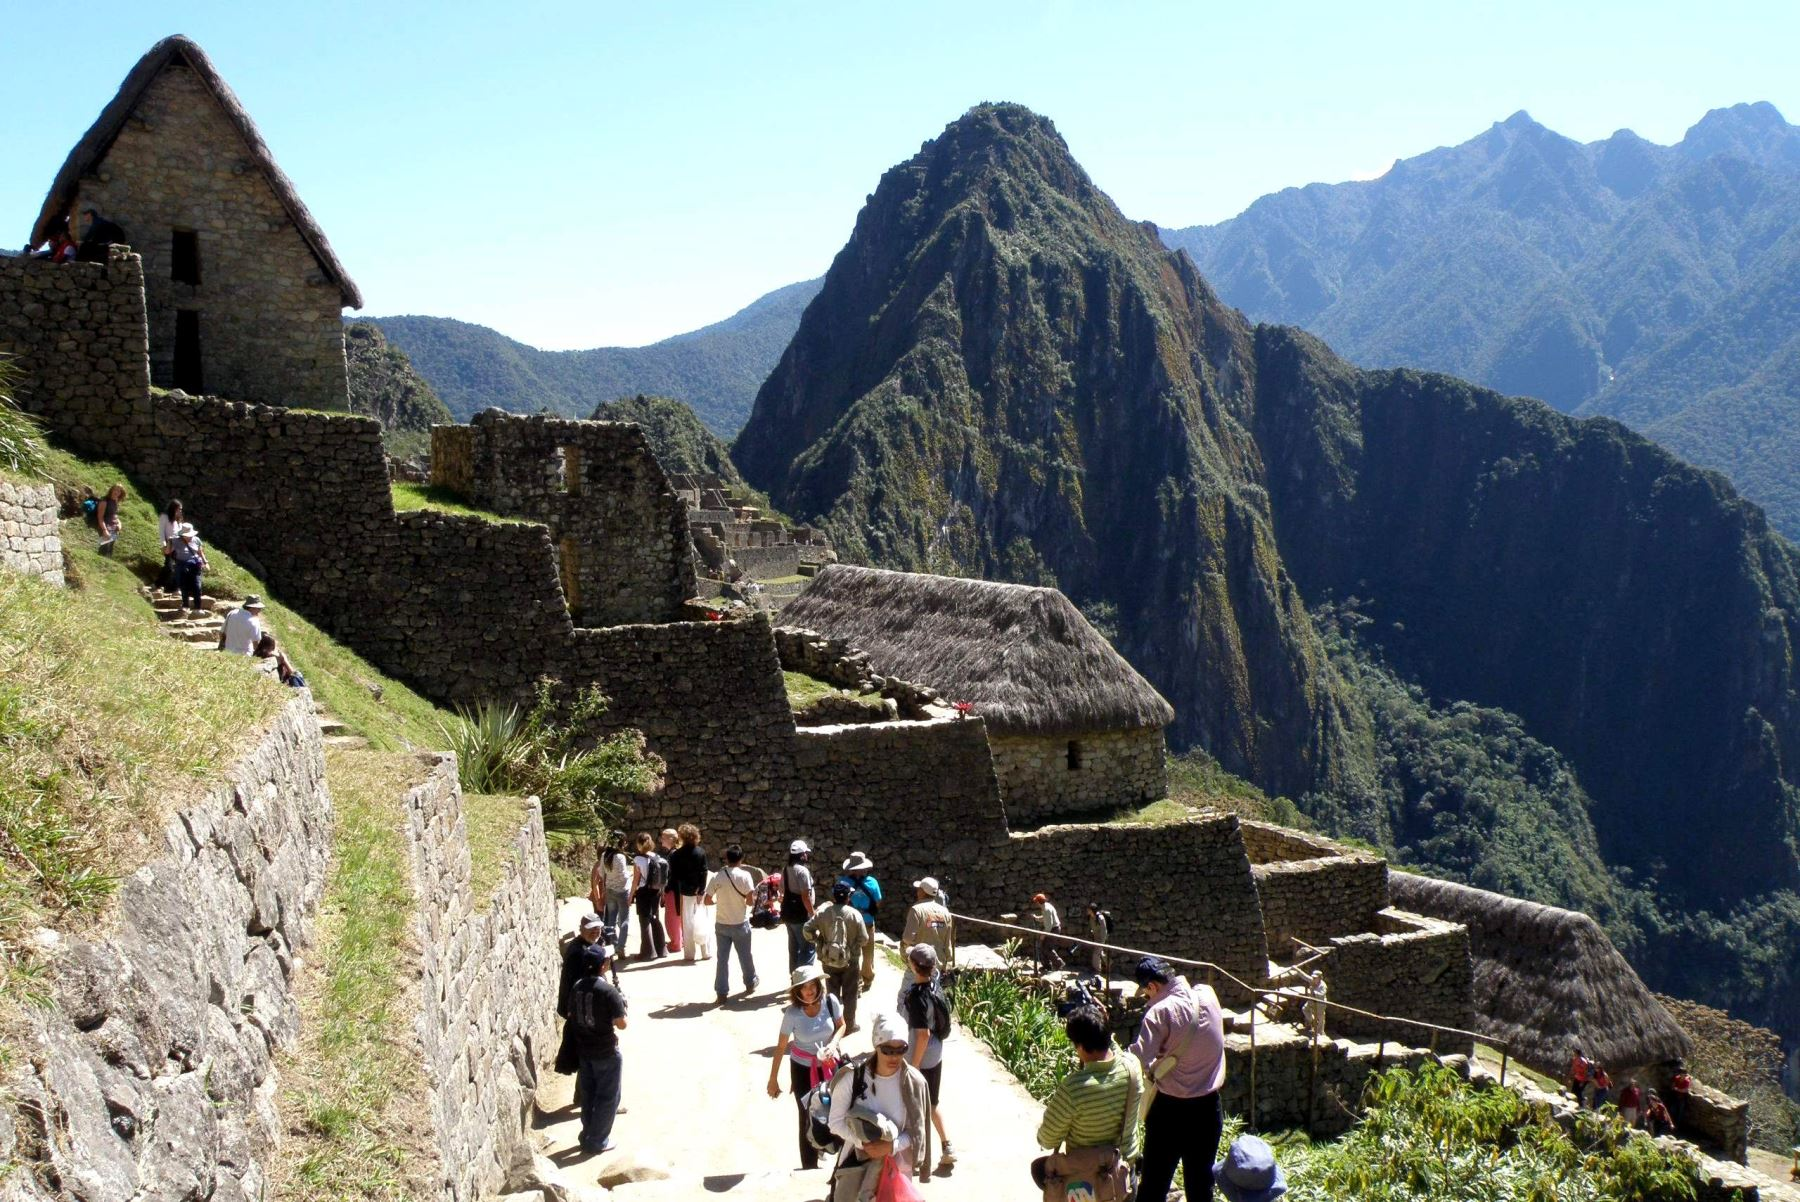 Turistas ya acceden a tarifa promocional vespertina para ingresar a Machu Picchu.